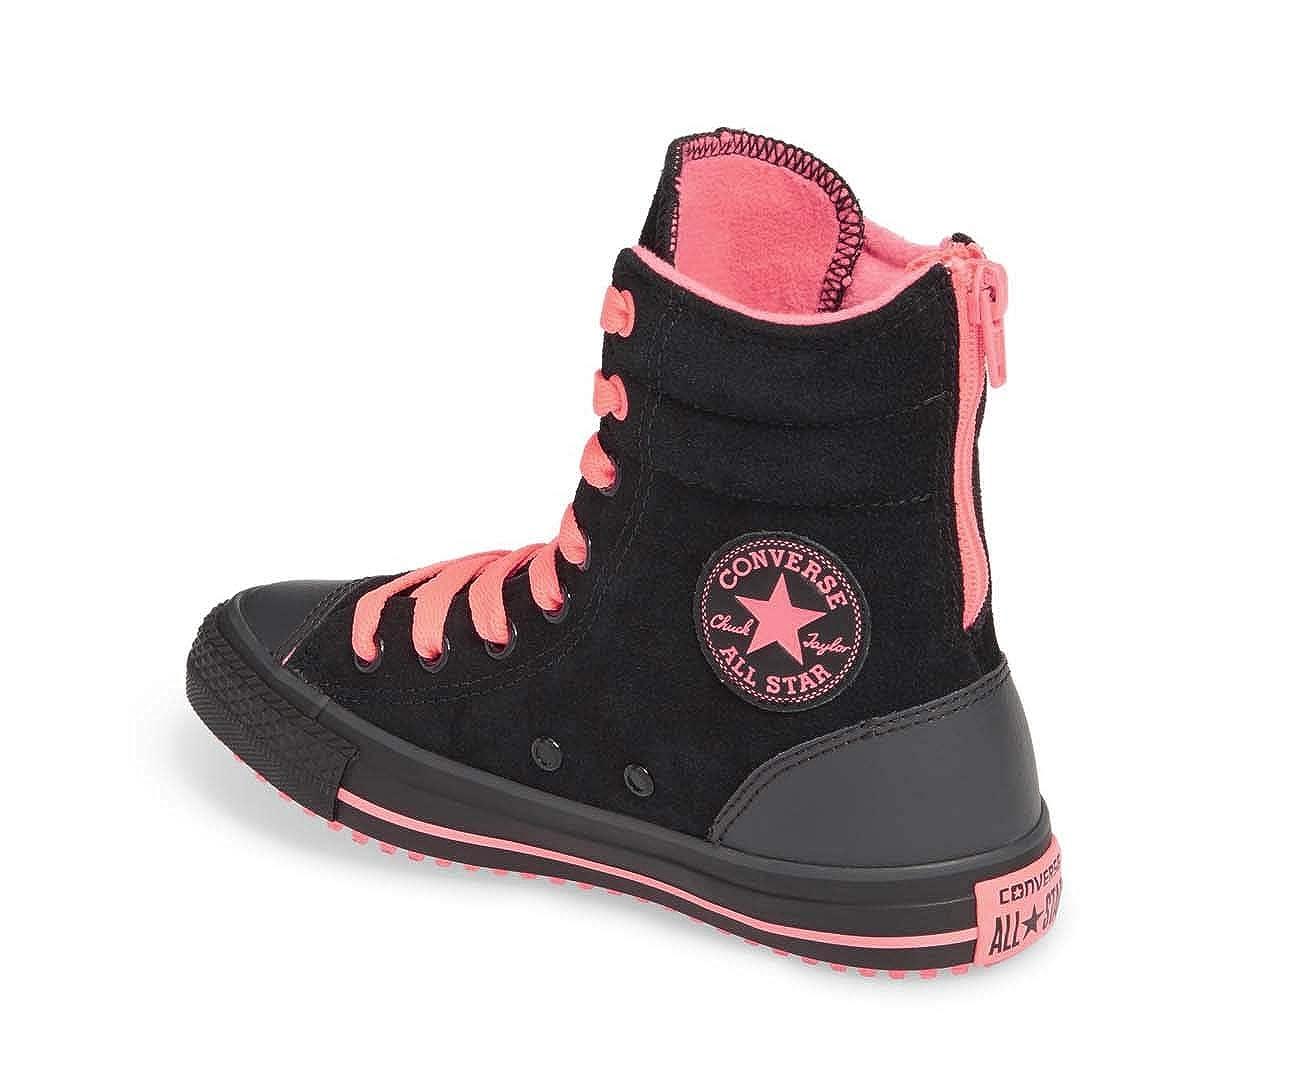 Converse Girls Hi Rise Boot Sneaker-Black//Hot Punch